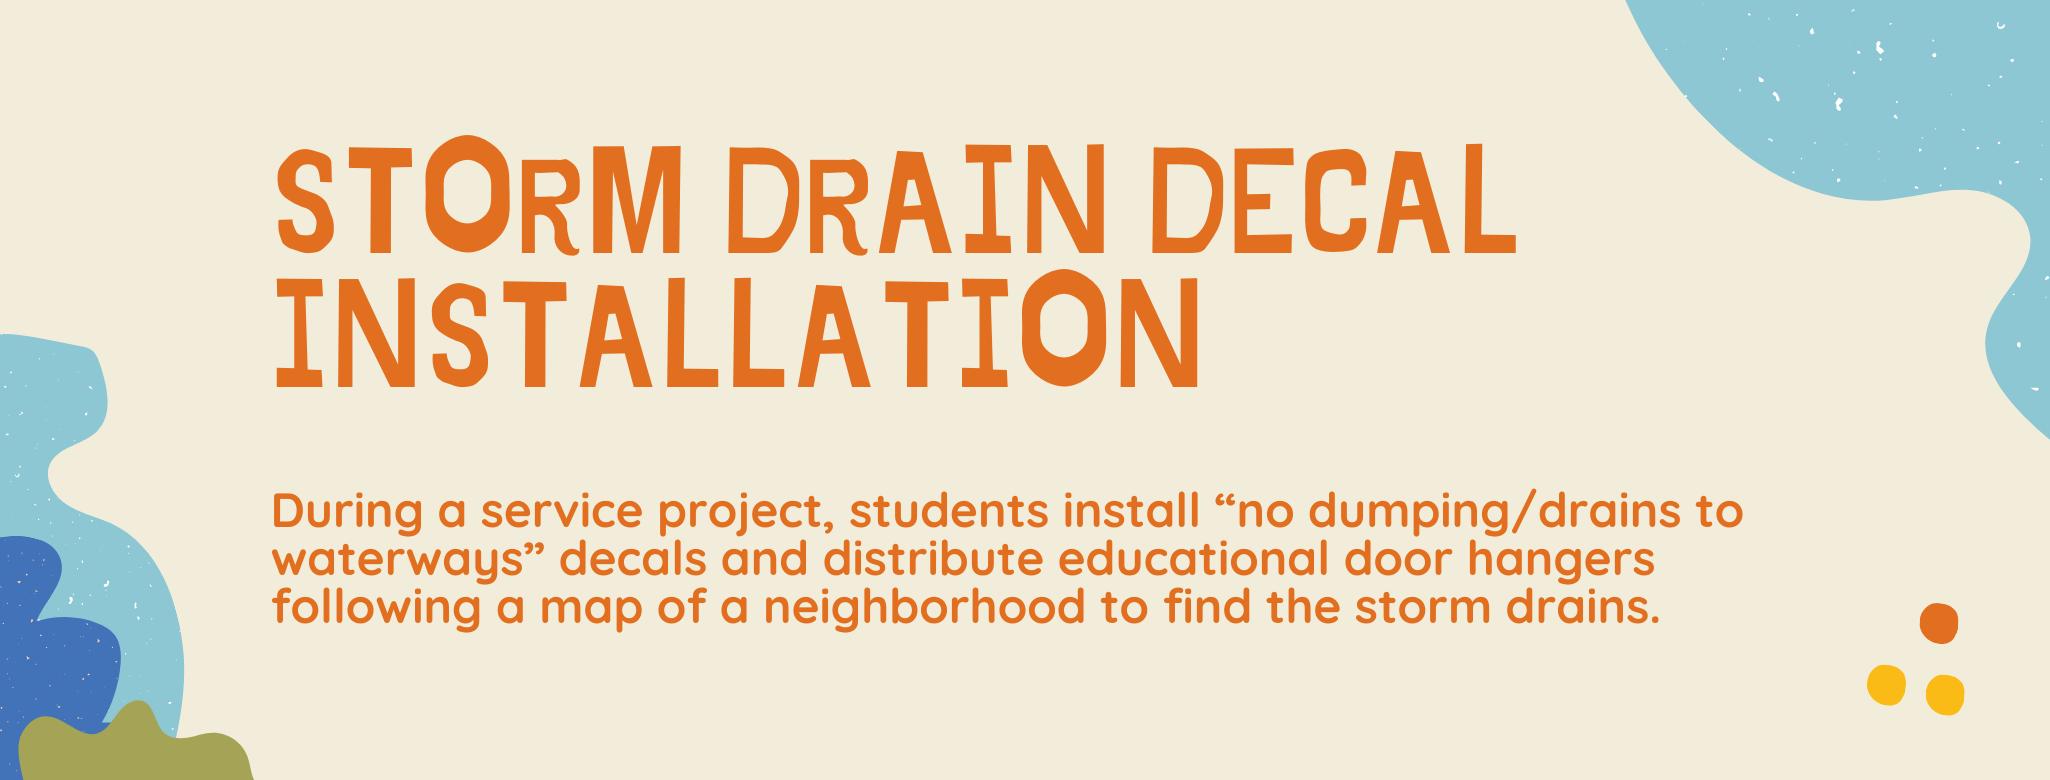 Storm Drain Decal Installation